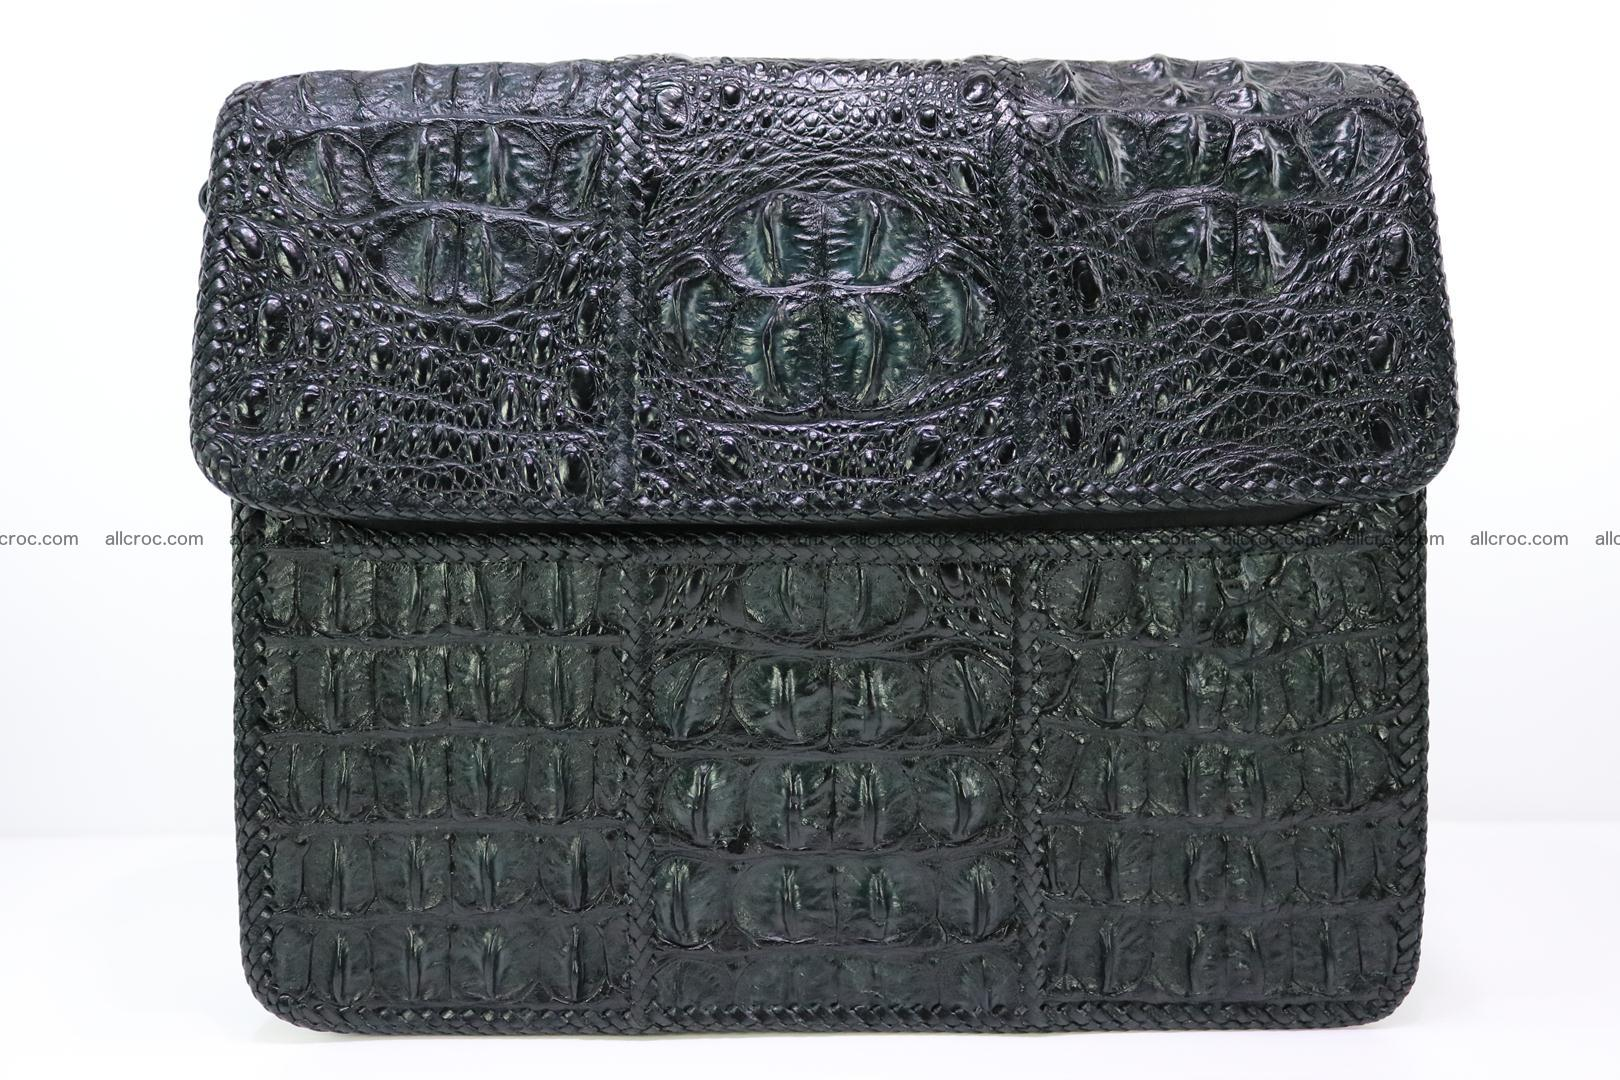 Crocodile skin shoulder bag with braided edges 147